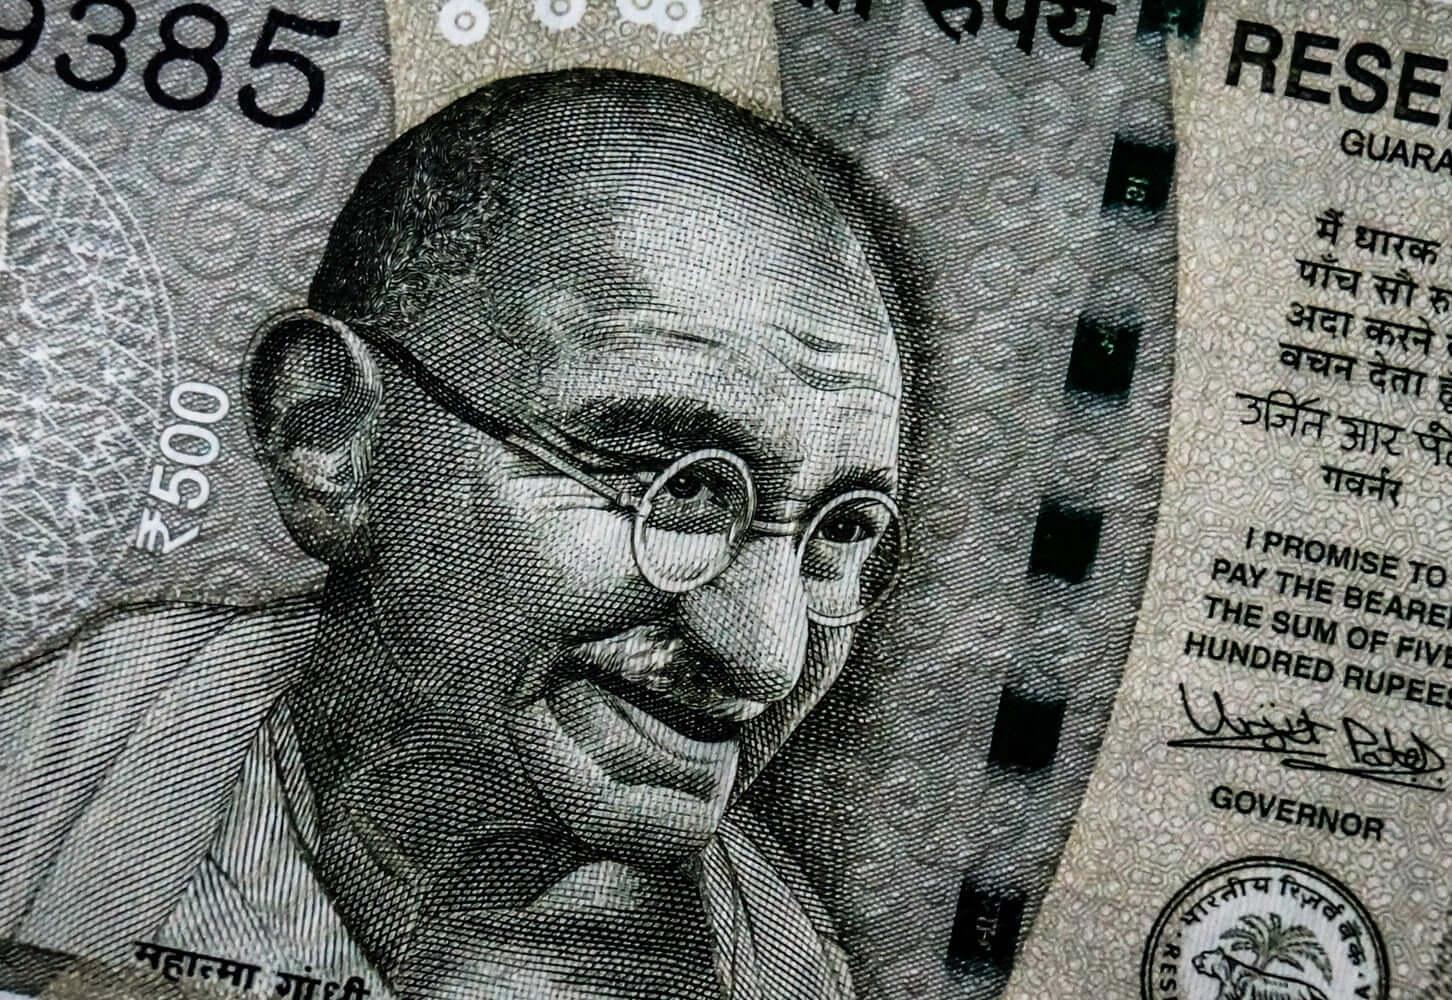 Rupee Depreciation: Is it a cause of concern?